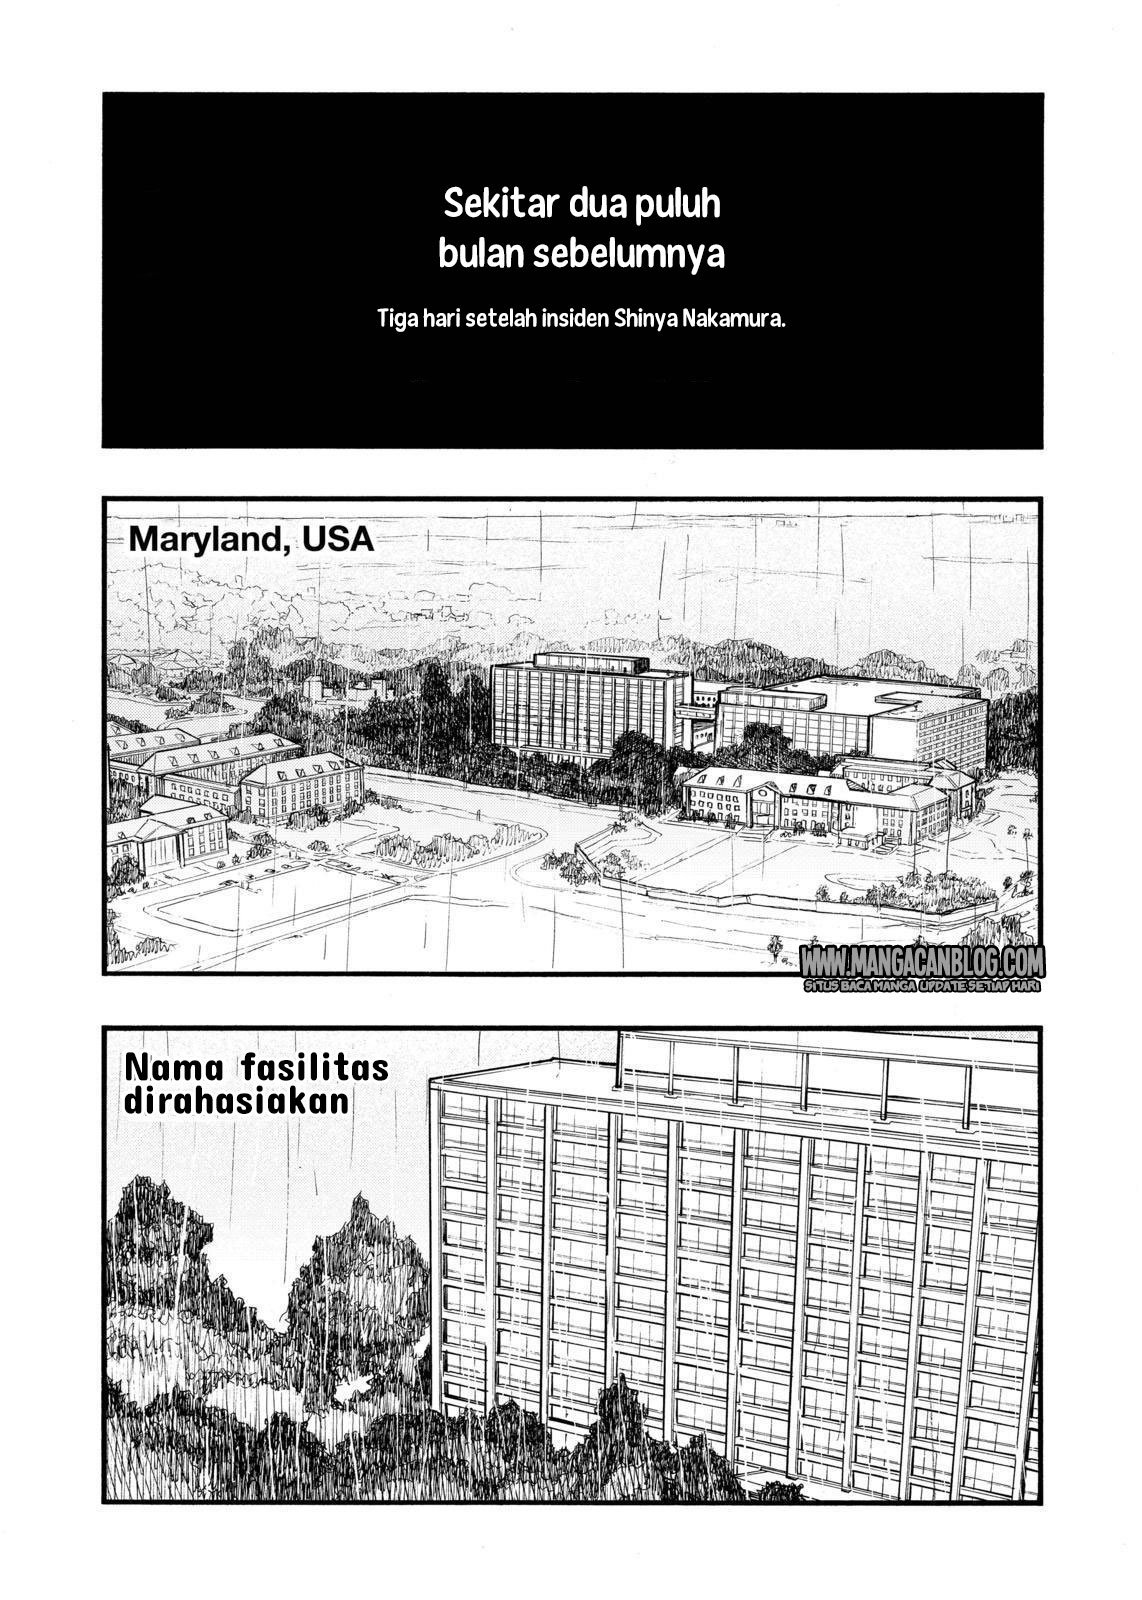 Dilarang COPAS - situs resmi www.mangacanblog.com - Komik ajin 046 - selamat pagi, sampai jumpa besok 47 Indonesia ajin 046 - selamat pagi, sampai jumpa besok Terbaru 1|Baca Manga Komik Indonesia|Mangacan